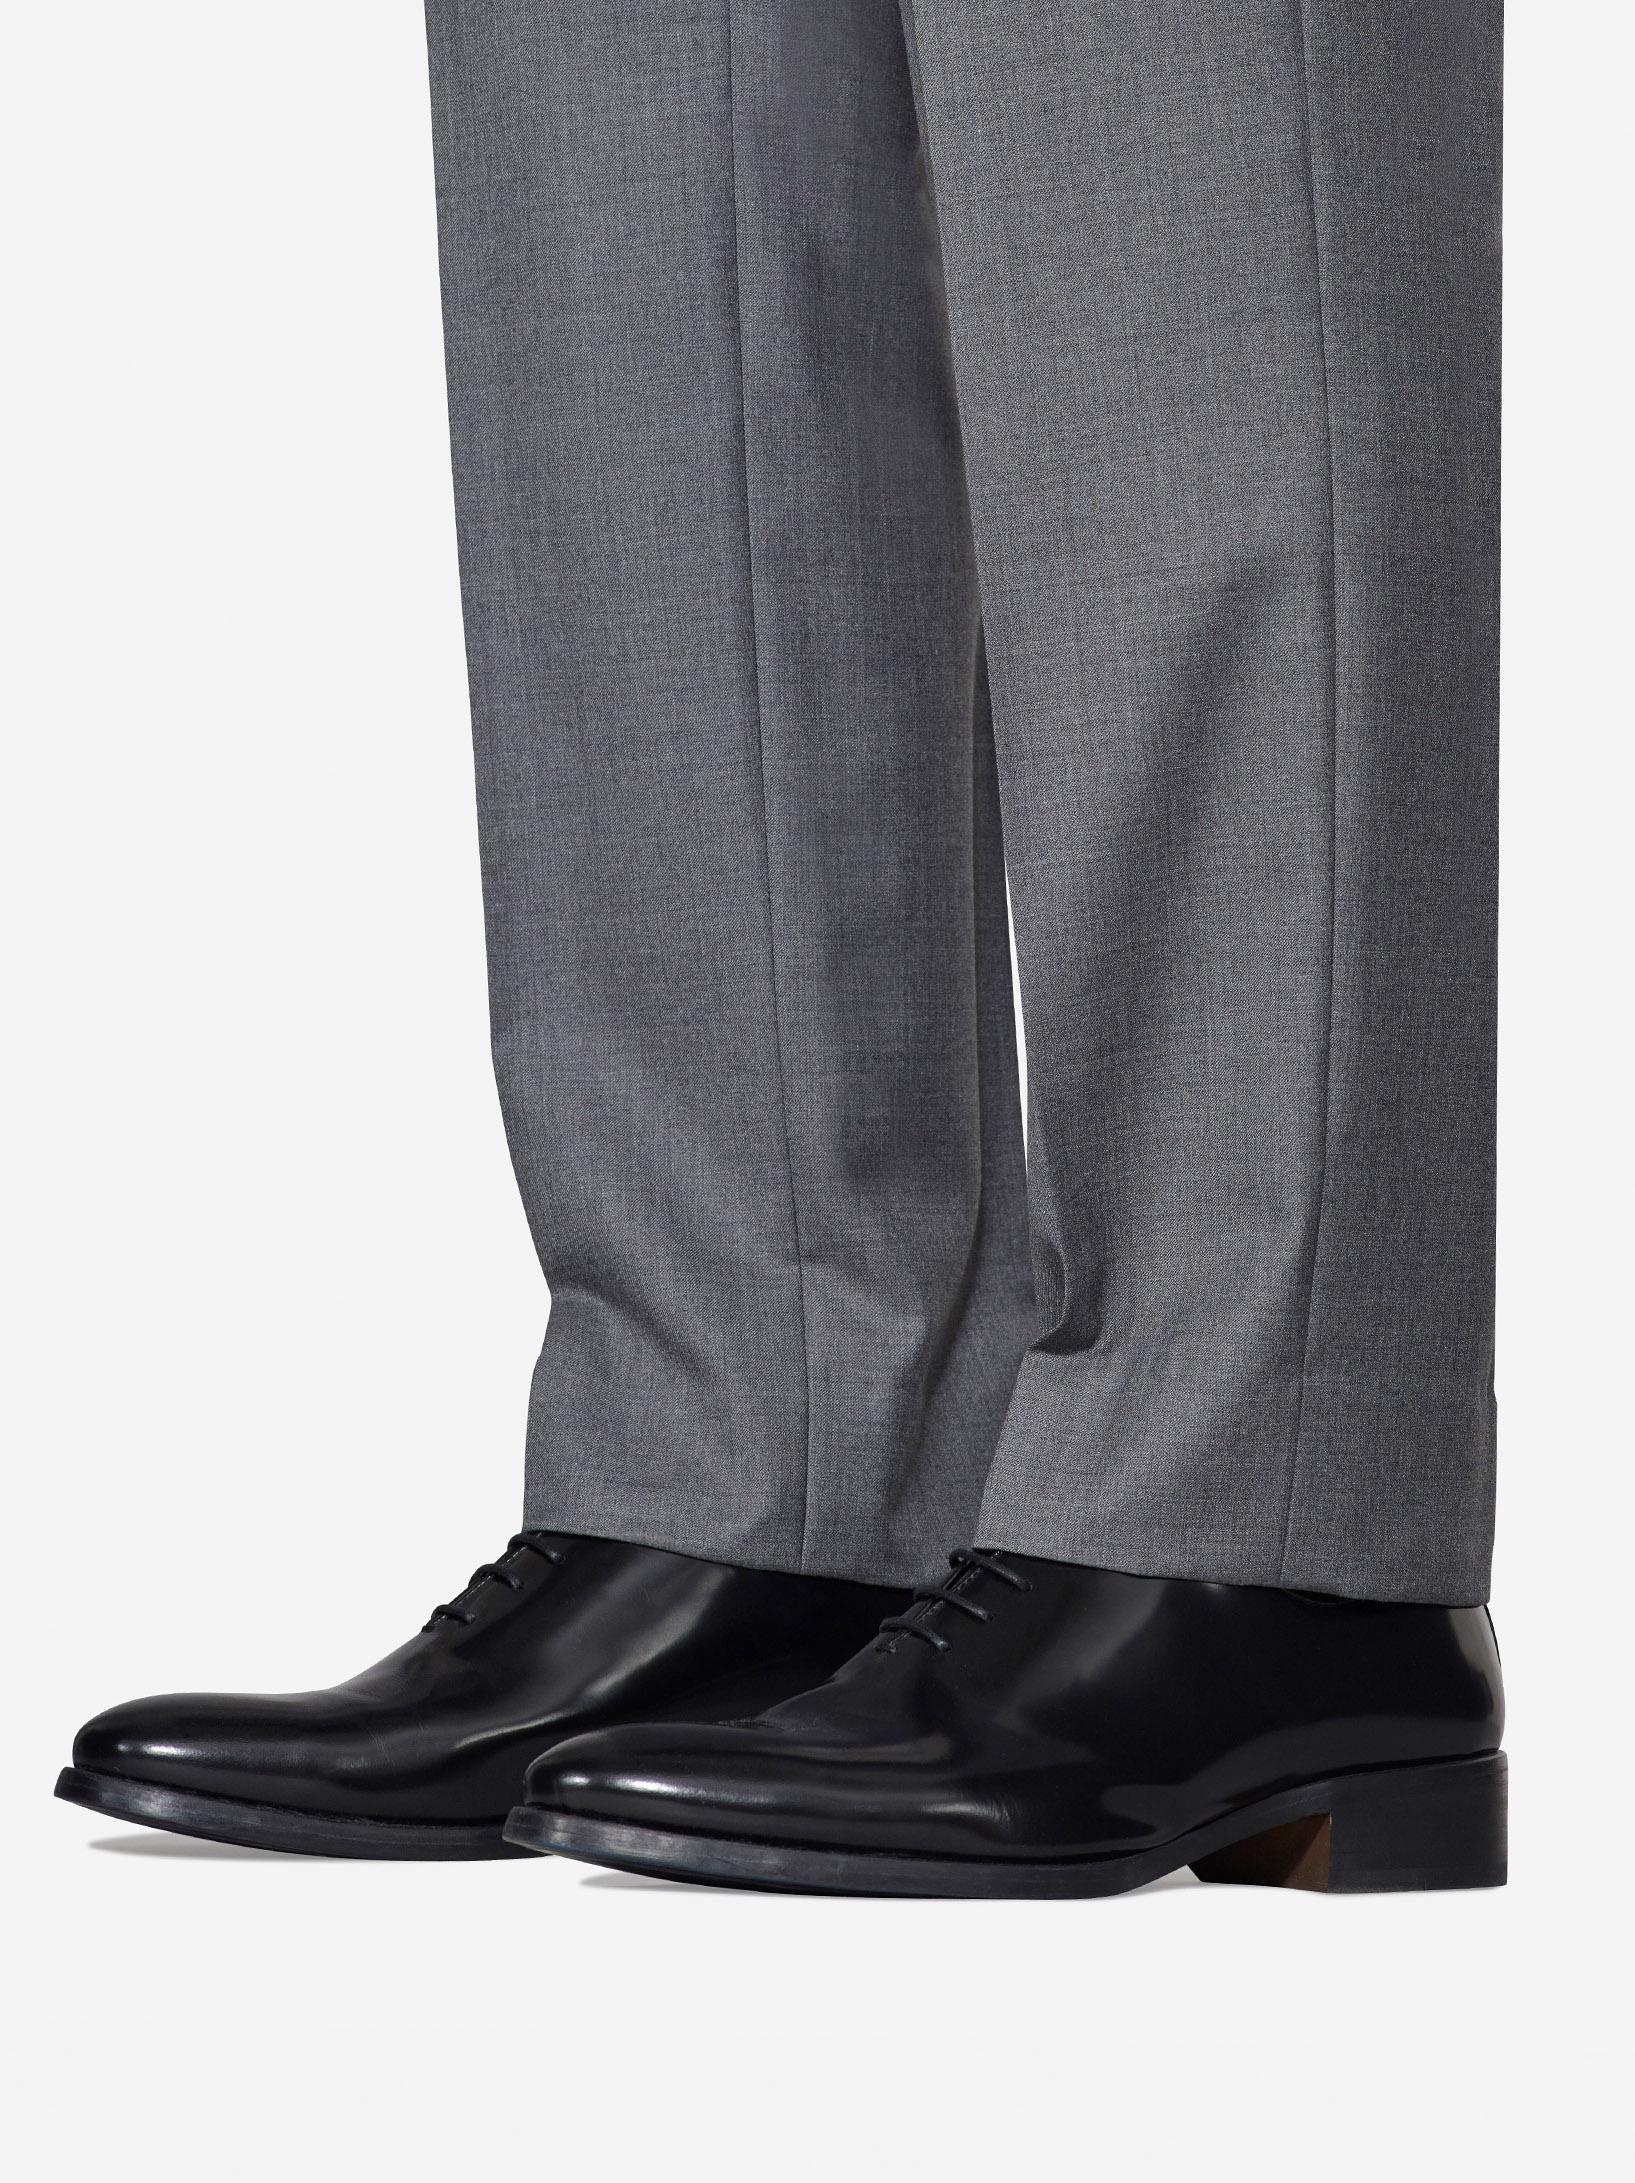 NO Cuffs trousers